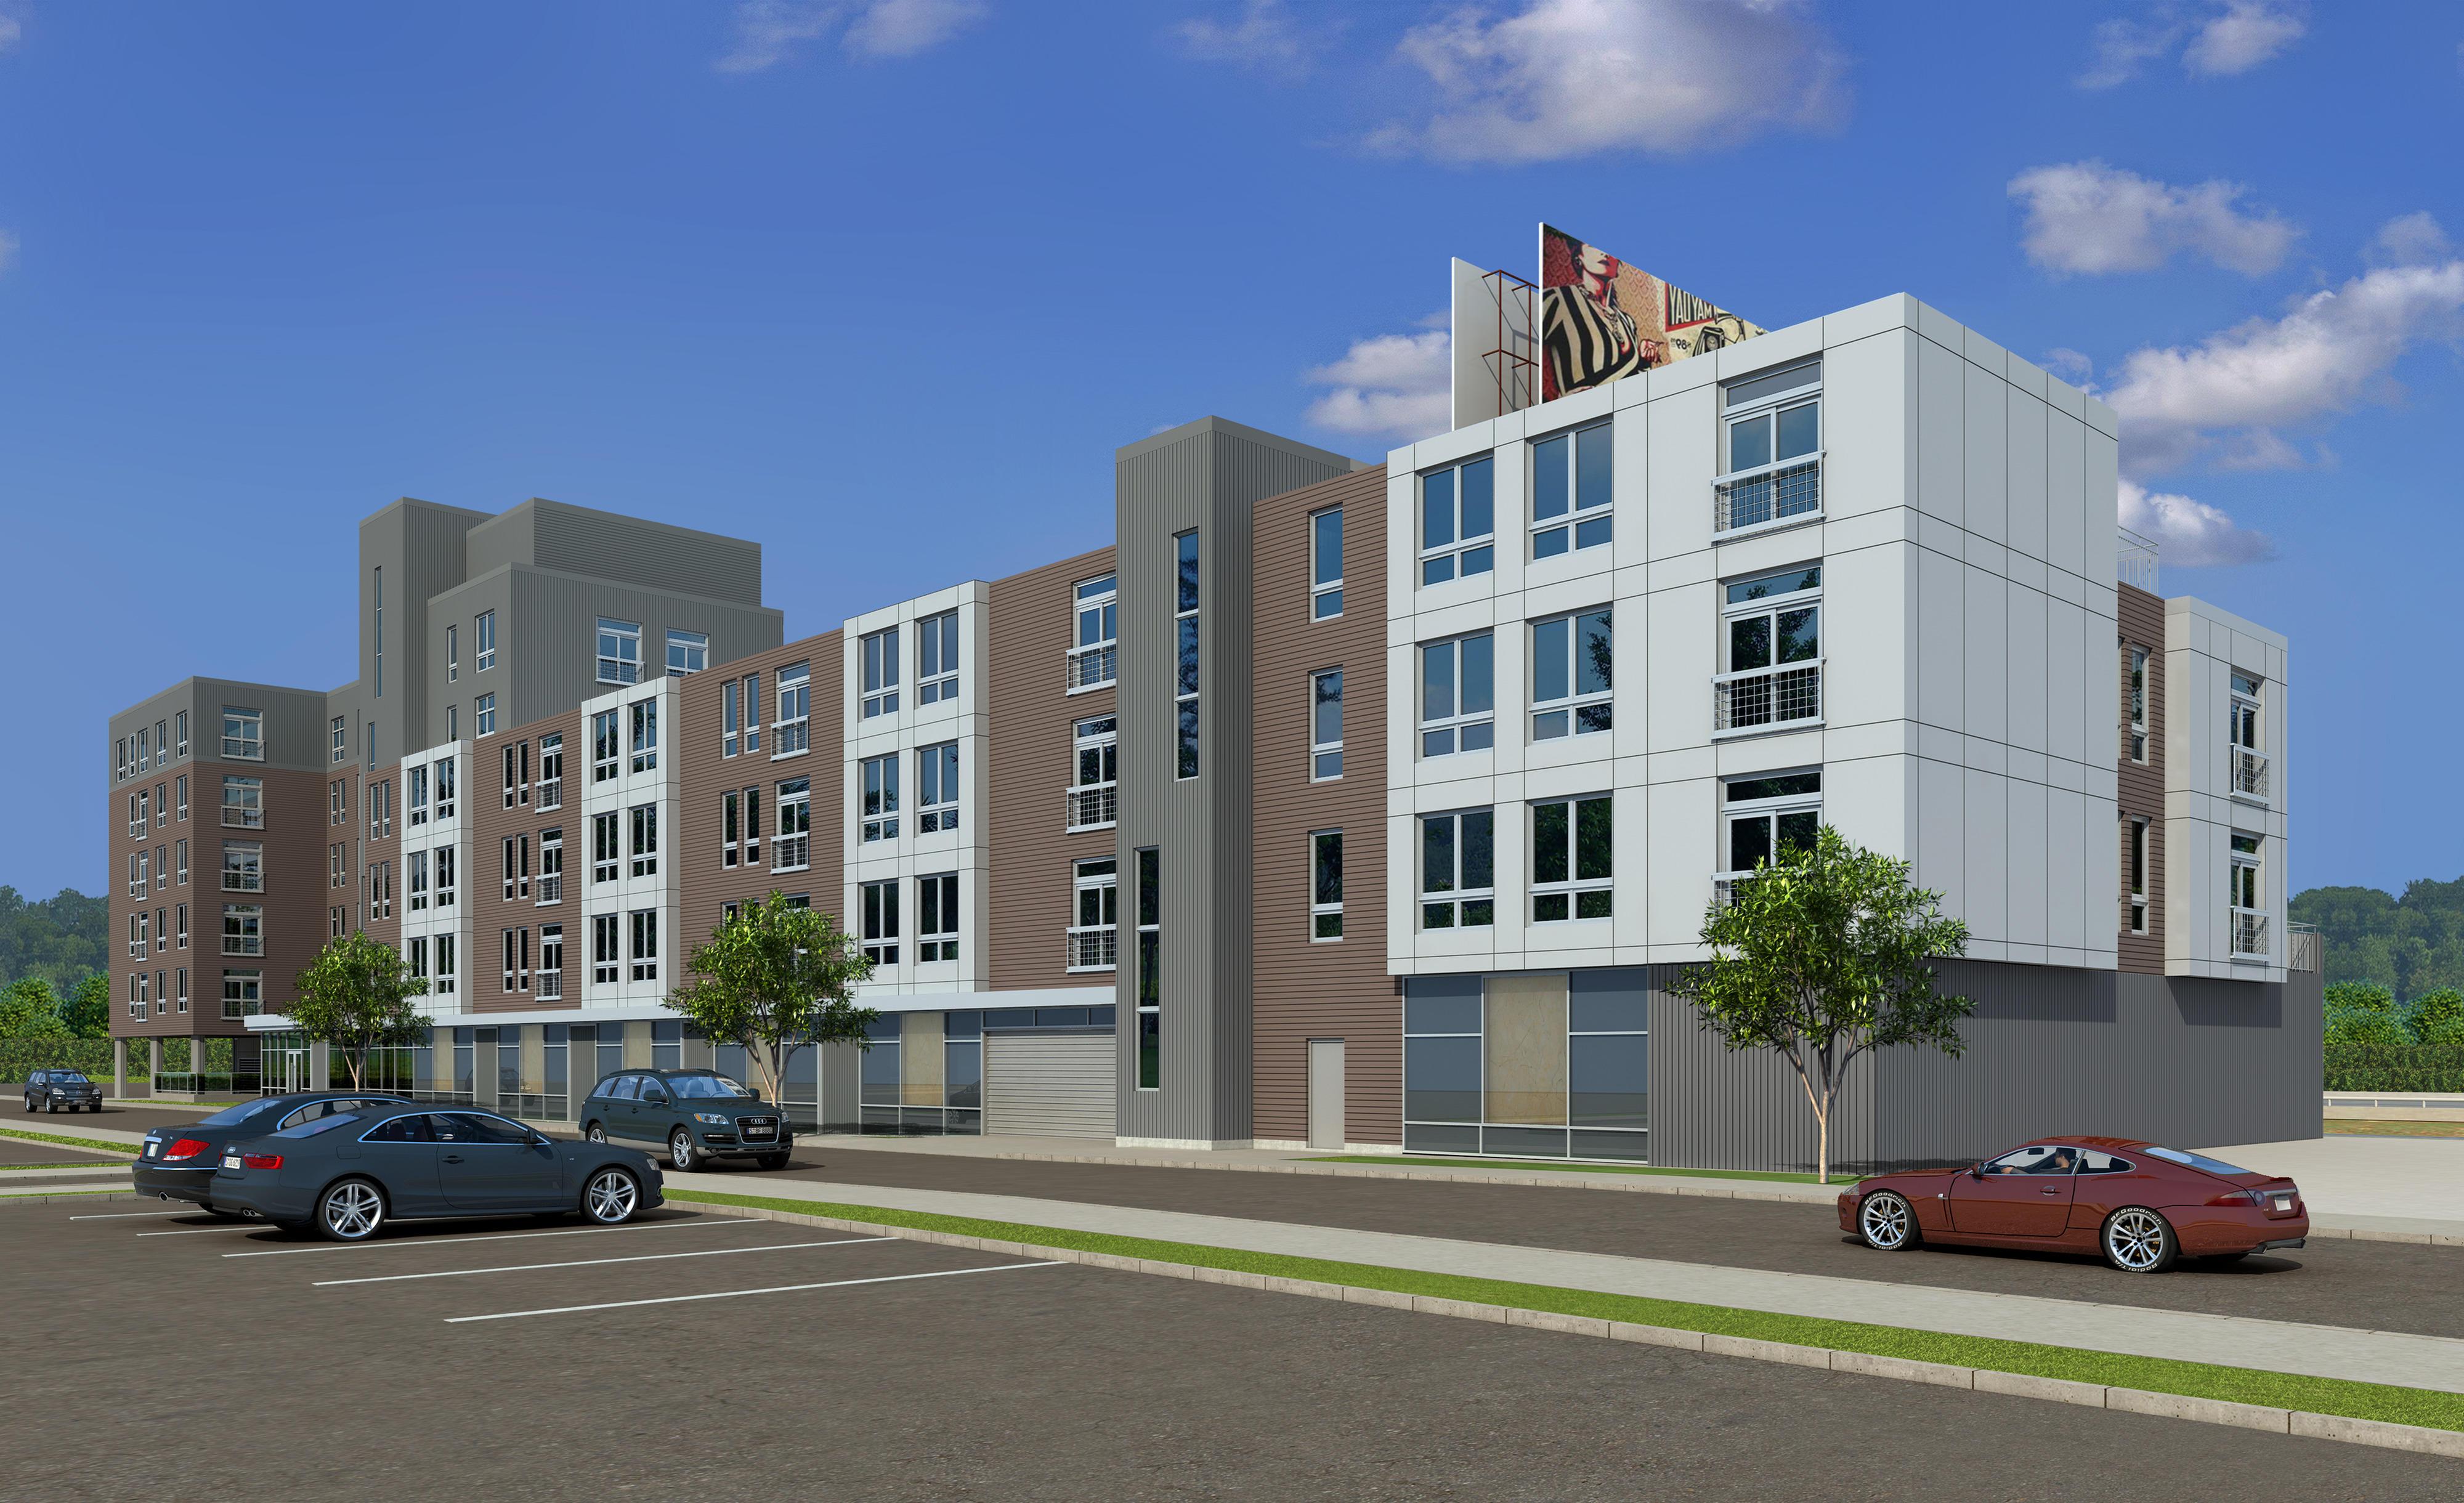 Apartment Rental Agency in MA Allston 02134 Trac75 75 Braintree St  (617)539-7575